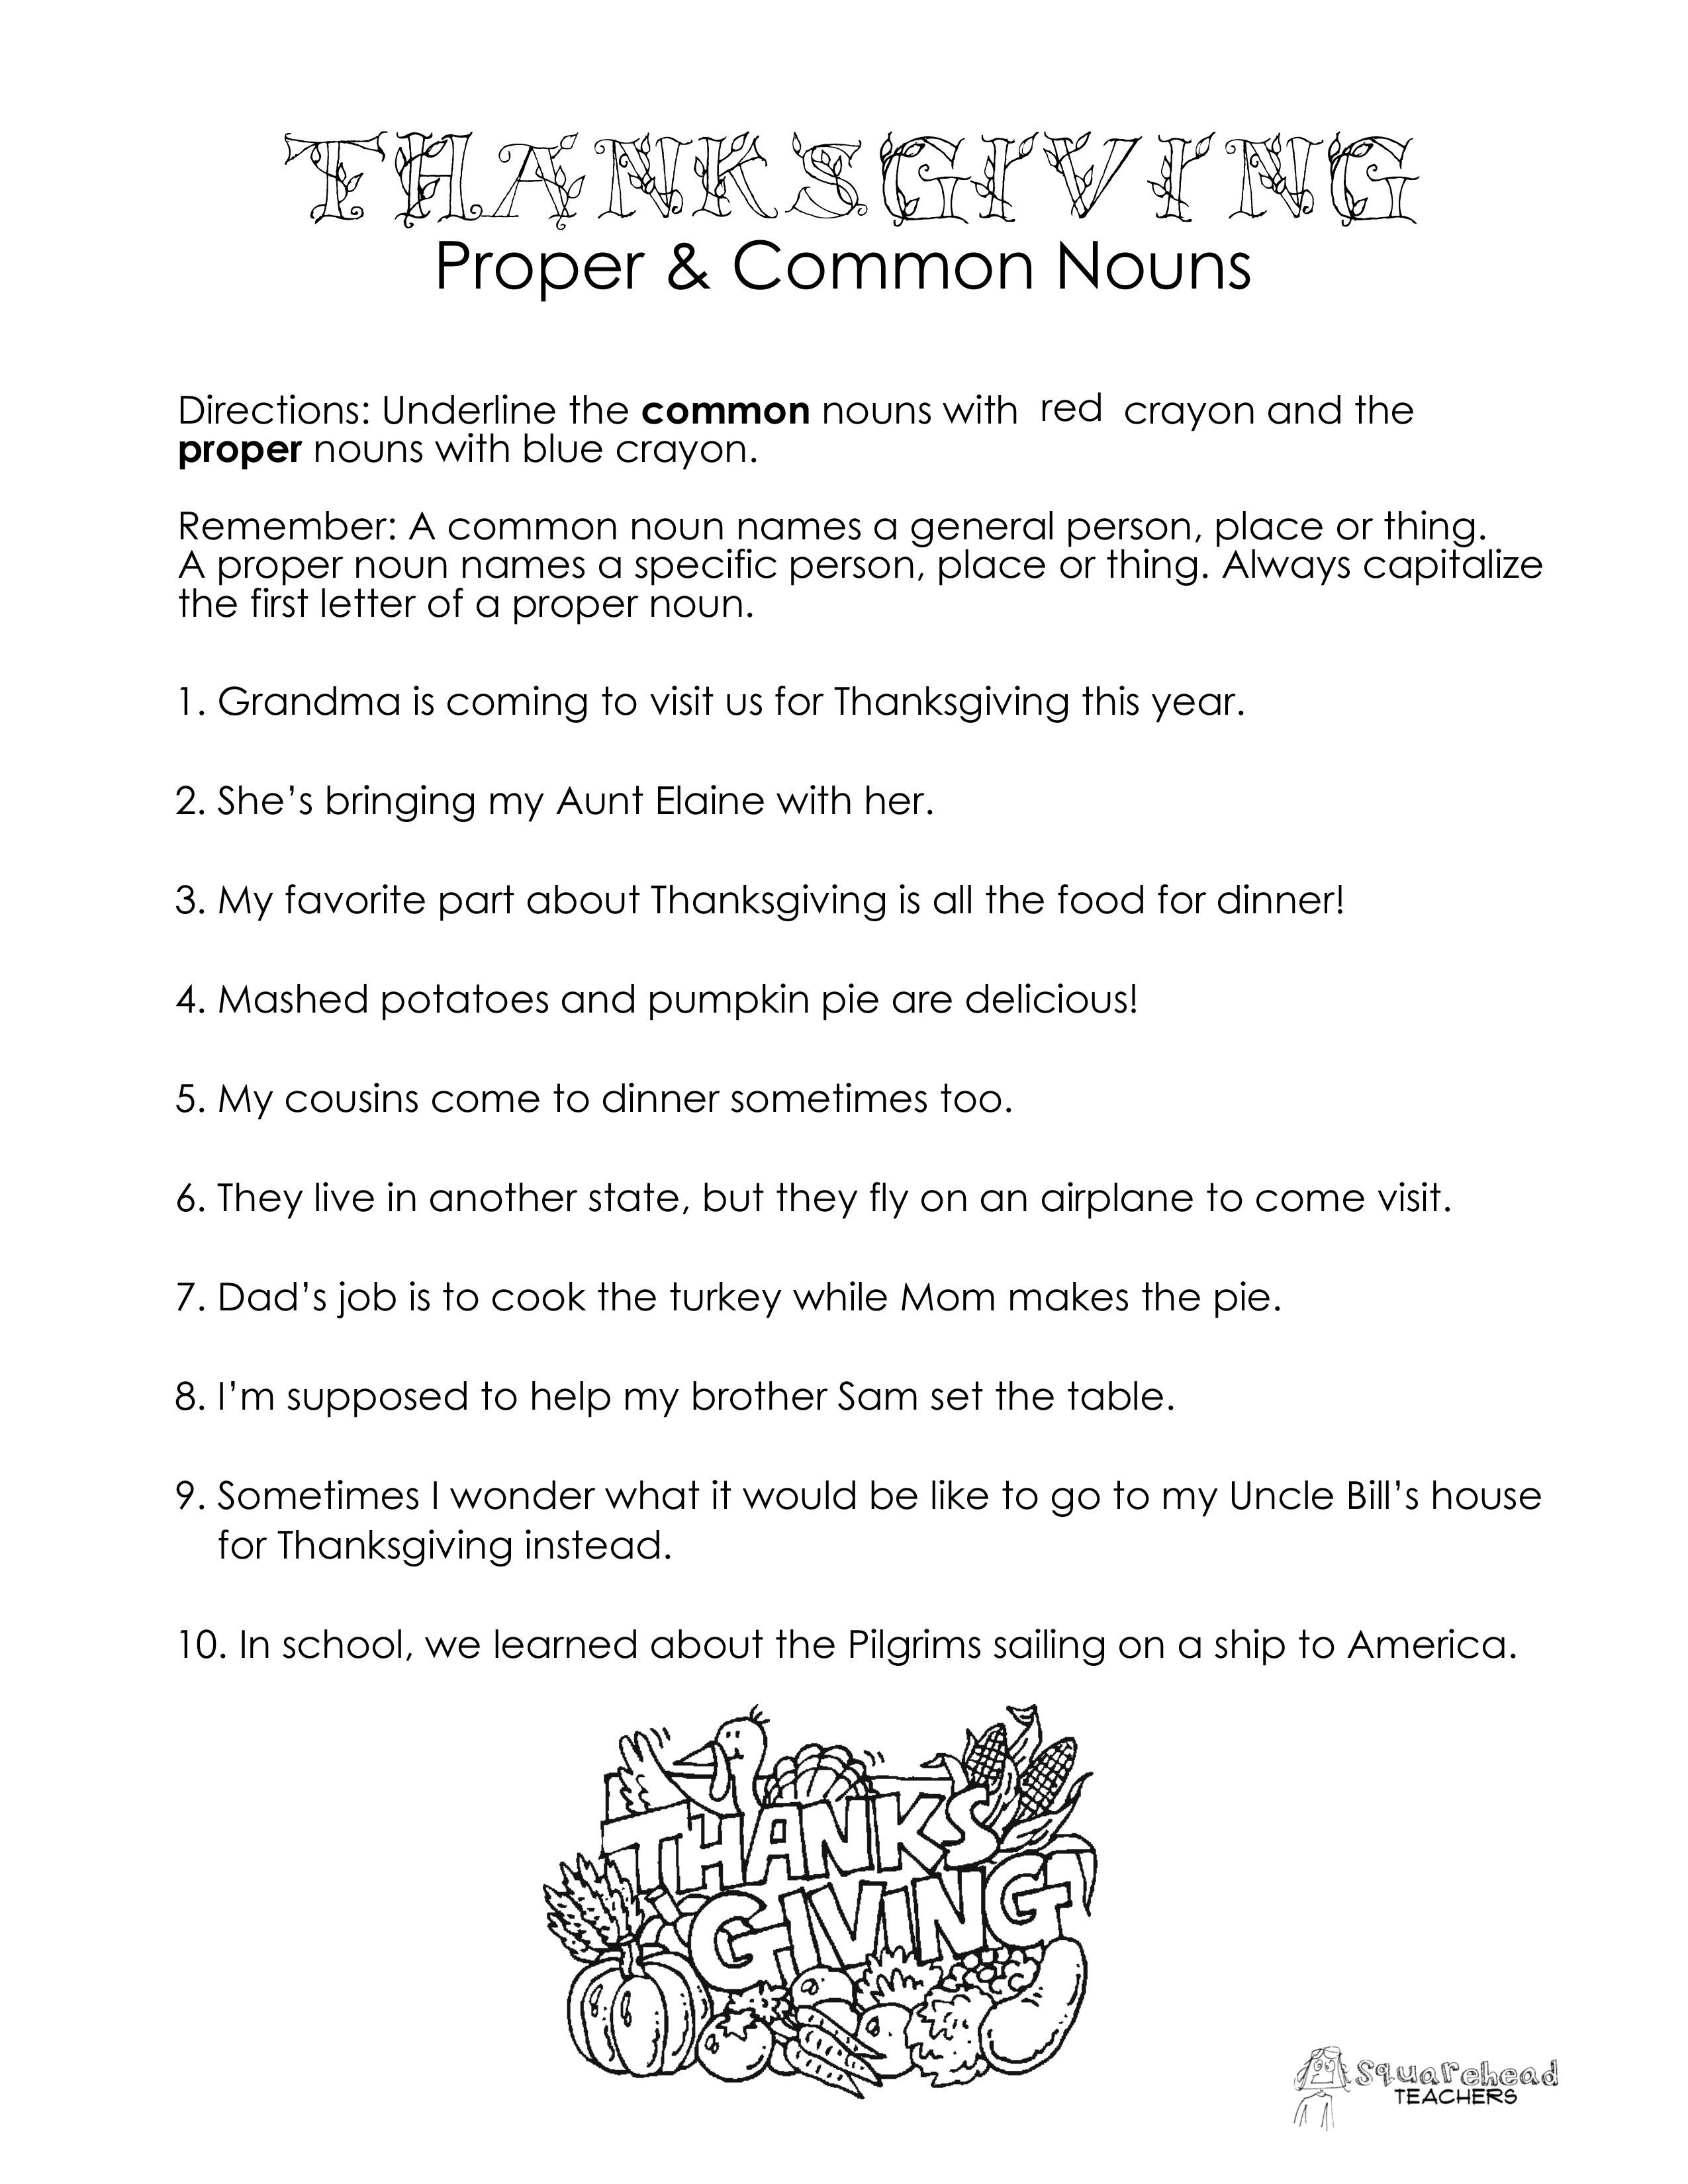 Thanksgiving Common Vs. Proper Nouns Worksheet | Squarehead Teachers - Free Printable Thanksgiving Worksheets For Middle School